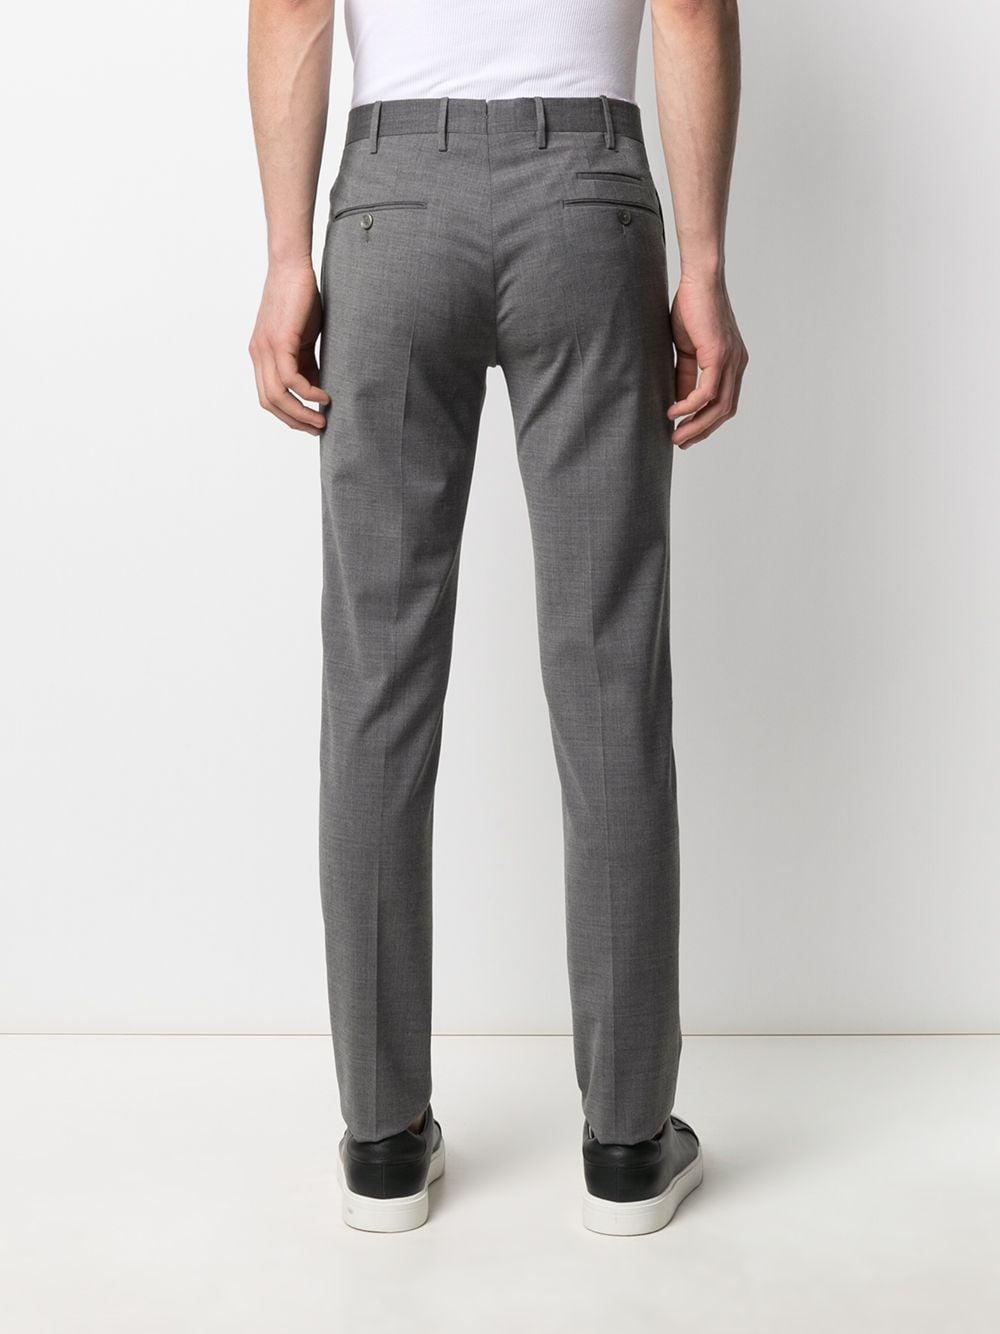 Melange grey stretch wool blend low-rise skinny trousers PT01 |  | COKSTVZ00TVL-PO350230